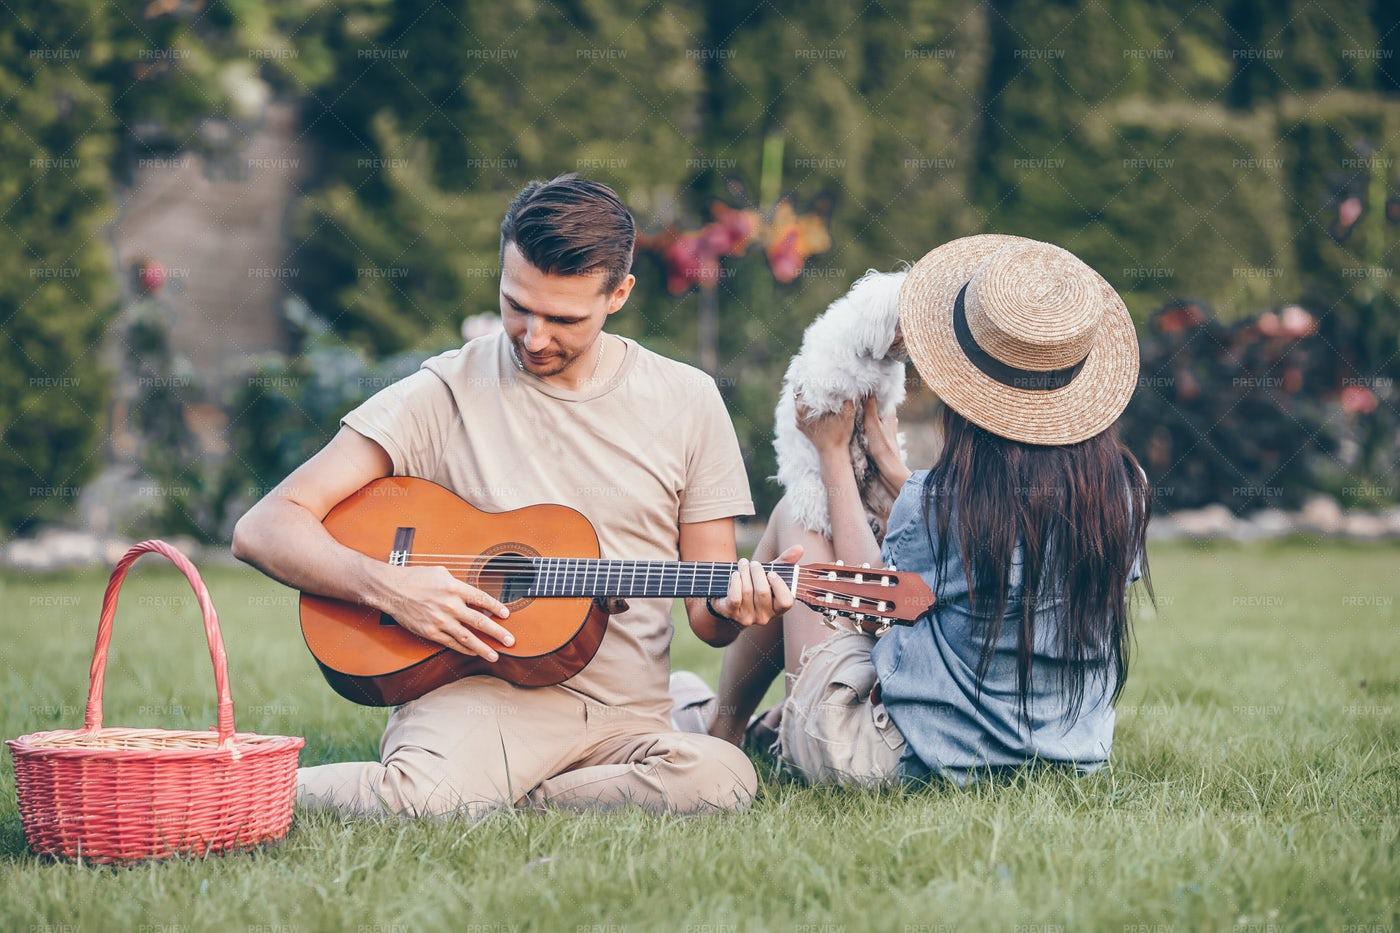 Serenade During Summer Picnic: Stock Photos